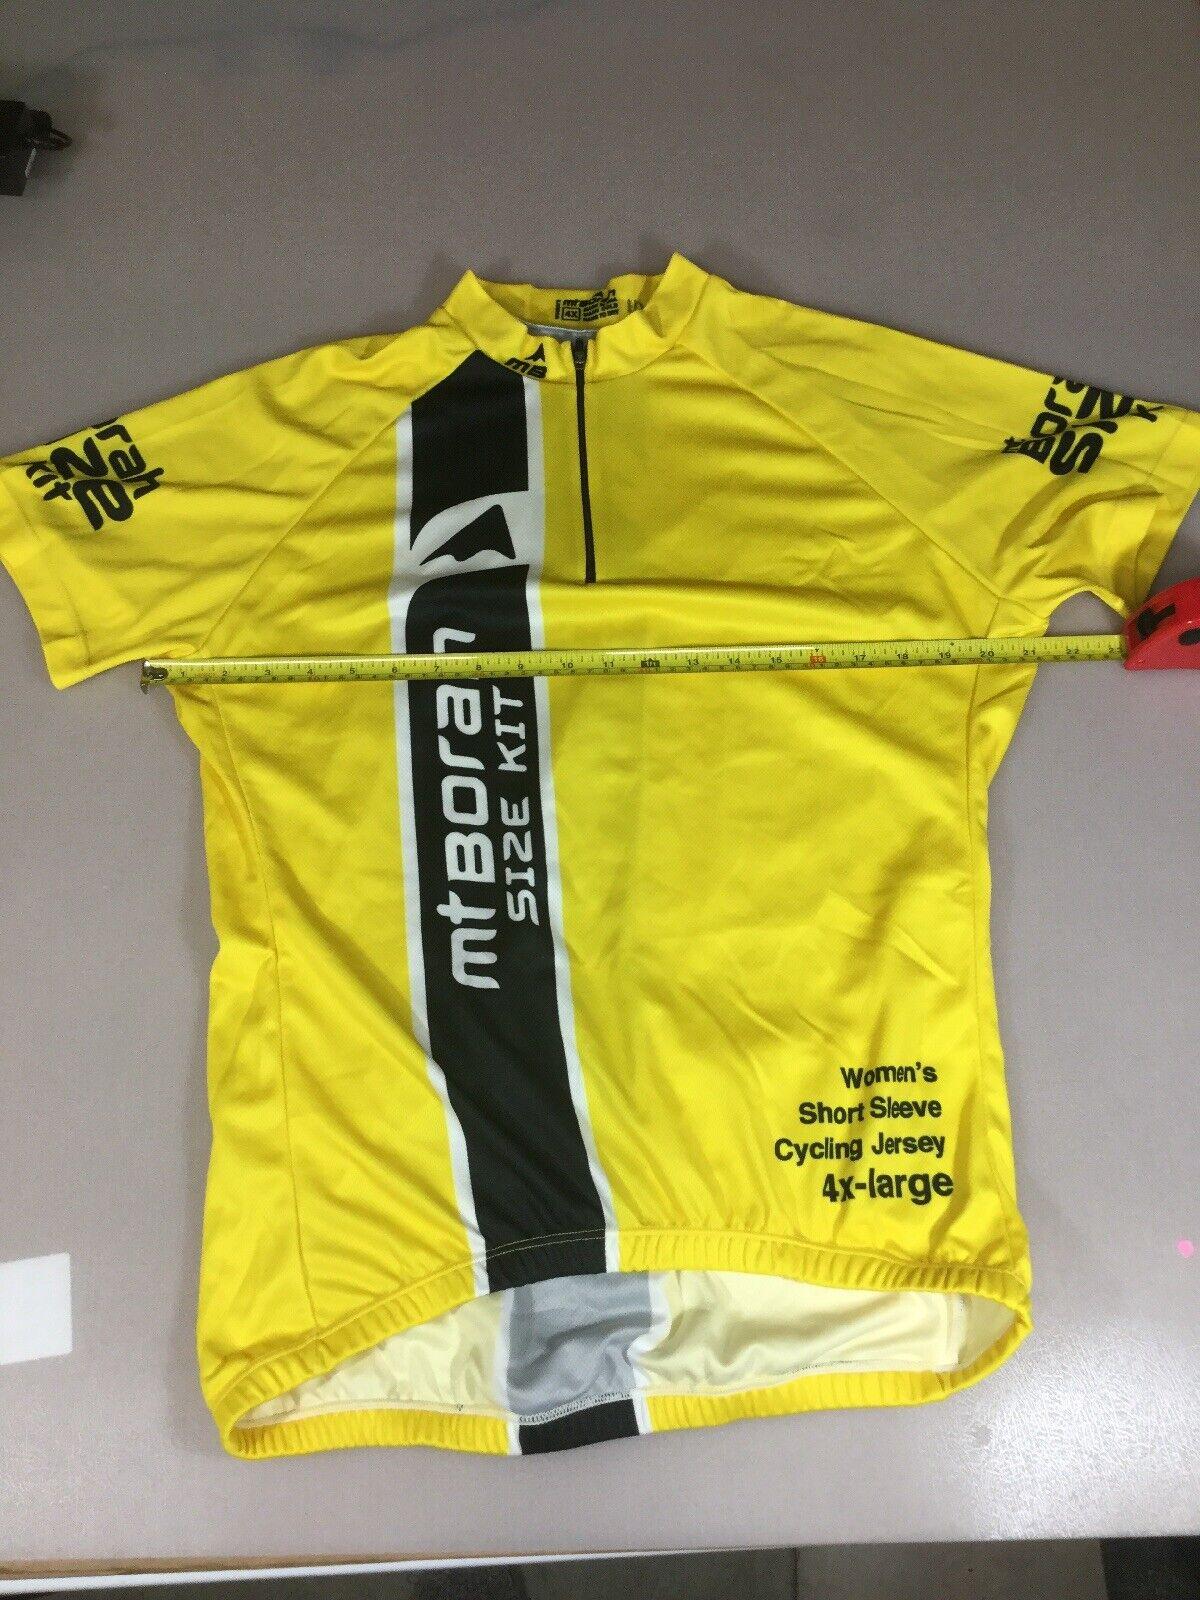 6910-26 Borah Teamwear Mens Cycling Jersey 4XL XXXXL